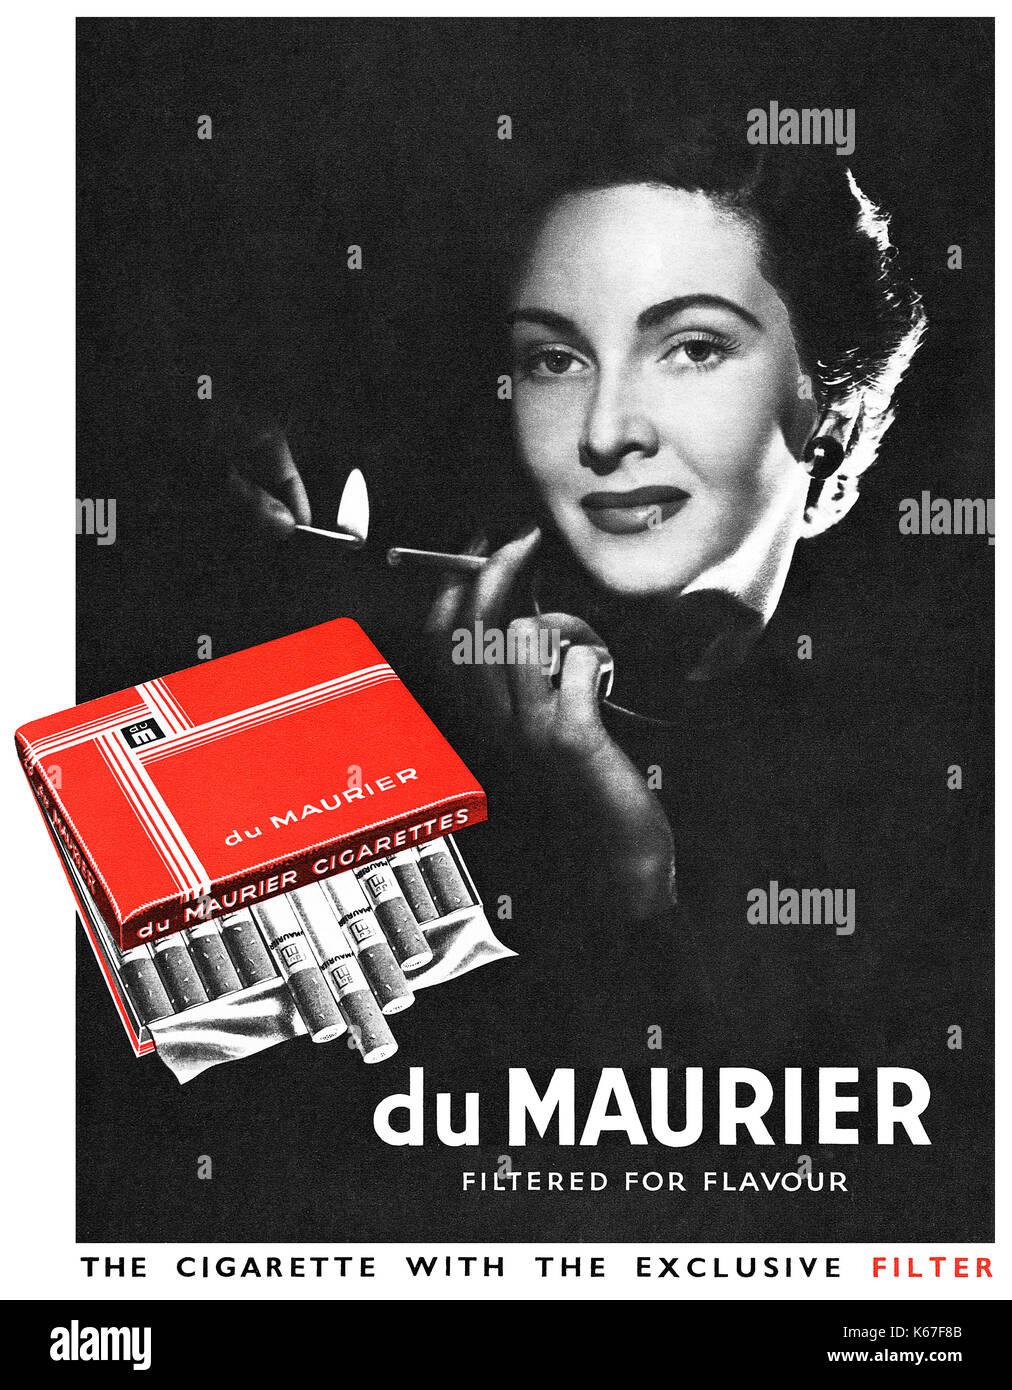 1949 British advertisement for du Maurier filtered cigarettes. - Stock Image